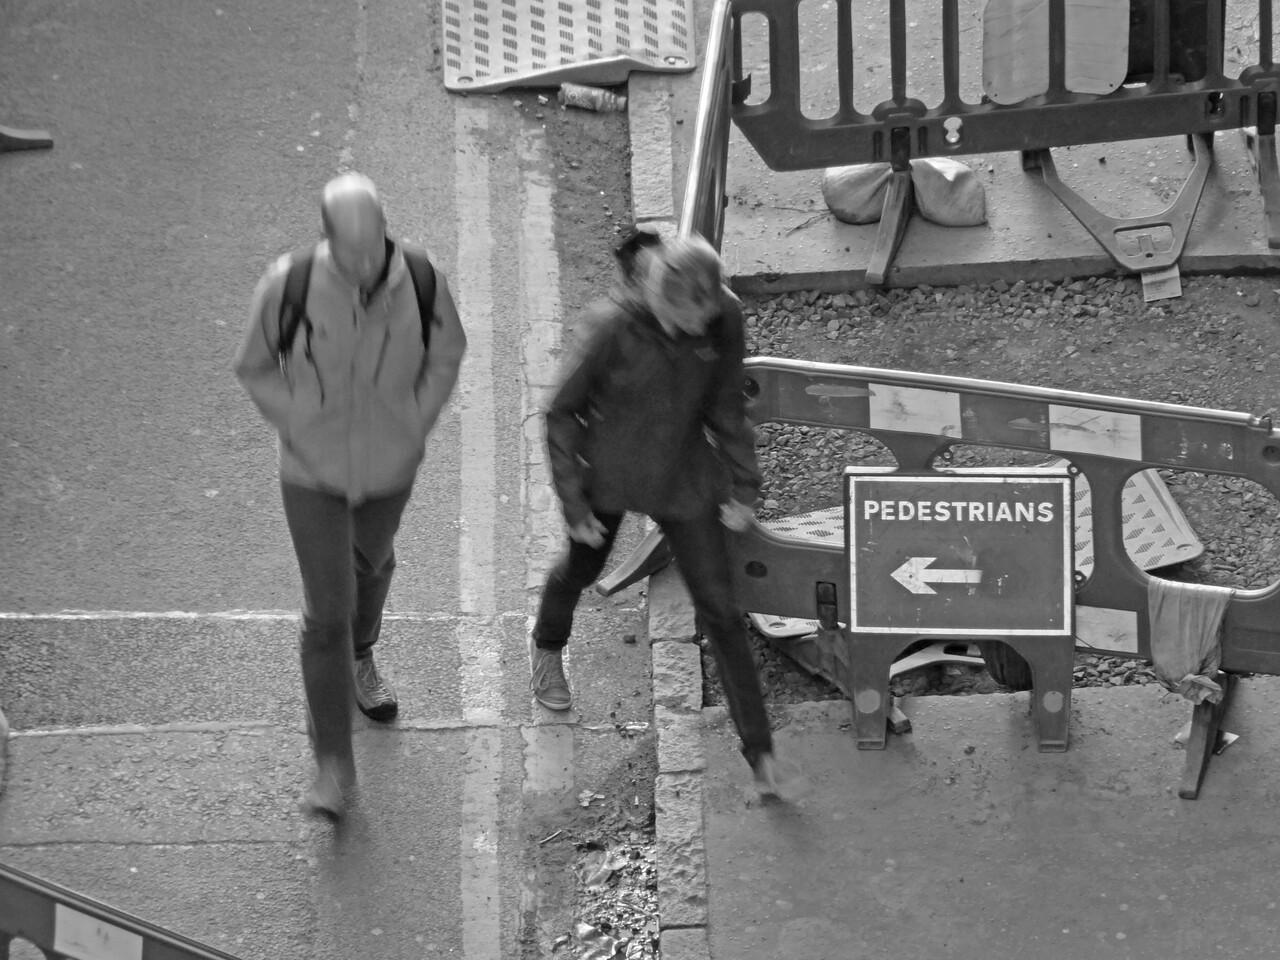 'Pedestrians' - Cowgate, Edinburgh - Edinburgh WorldWide PhotoWalk.